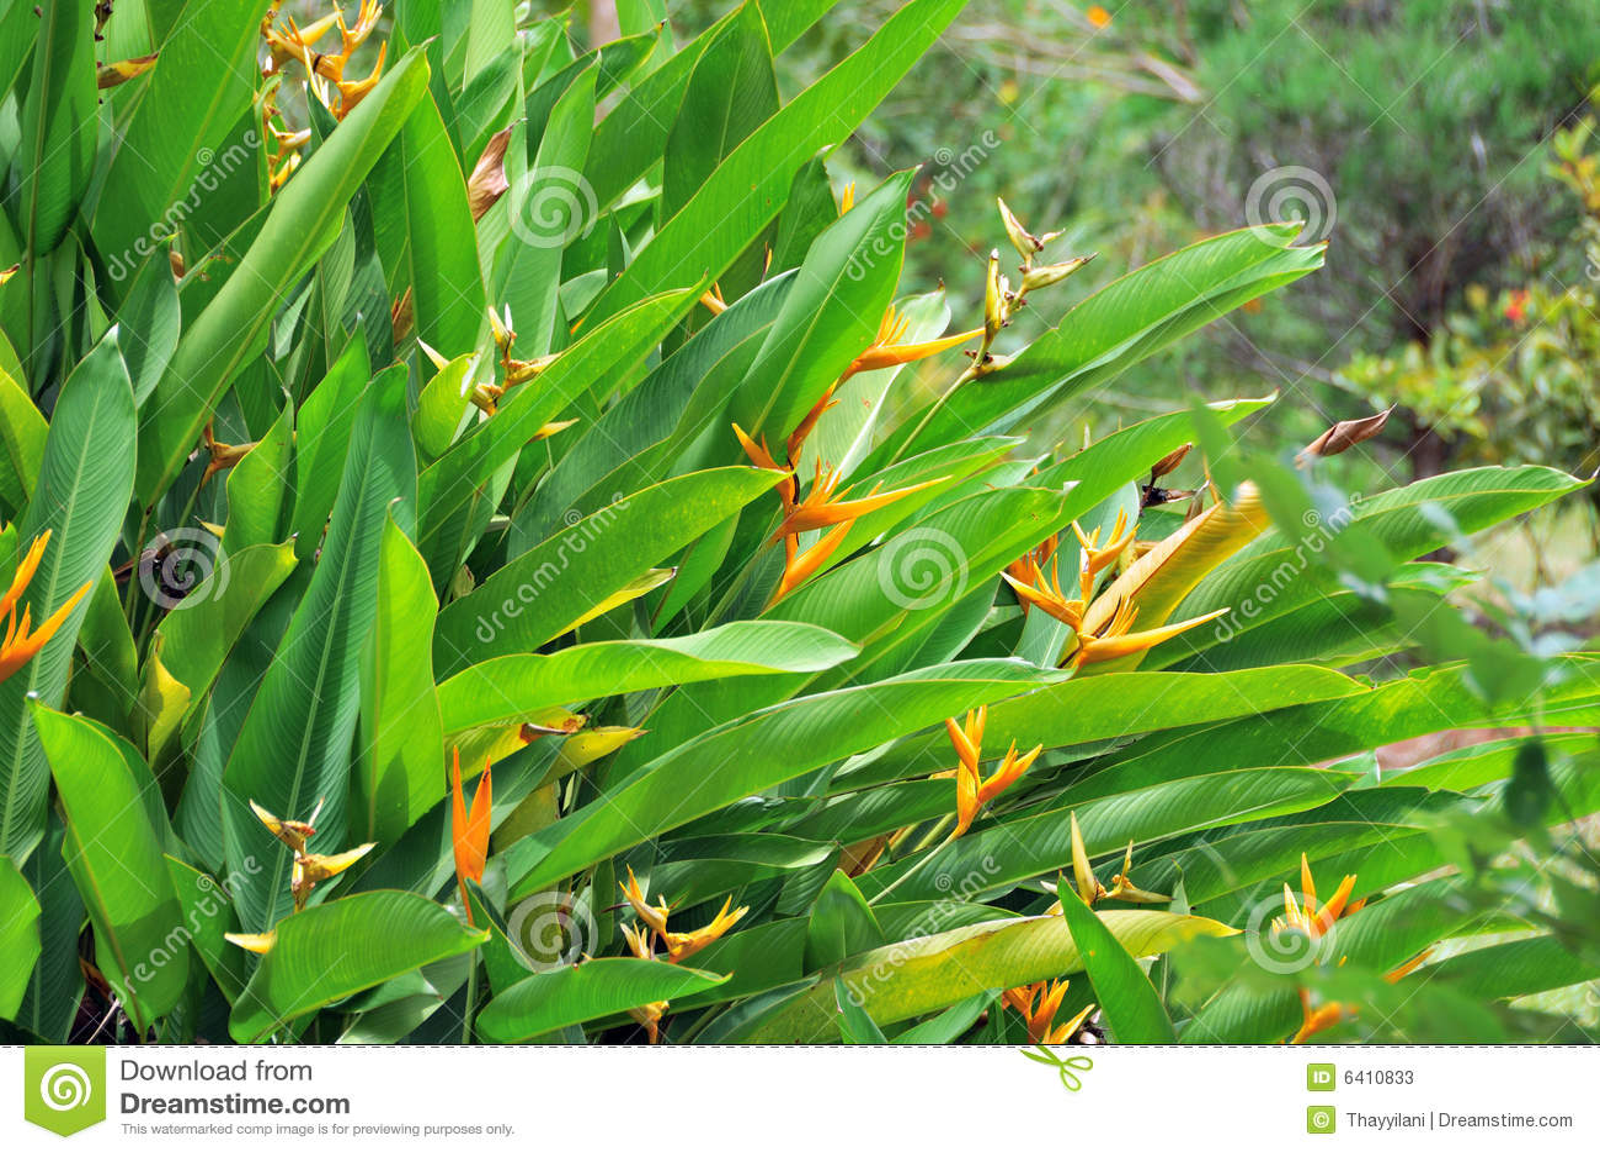 imagens de jardim tropicalExotic Tropical Plants